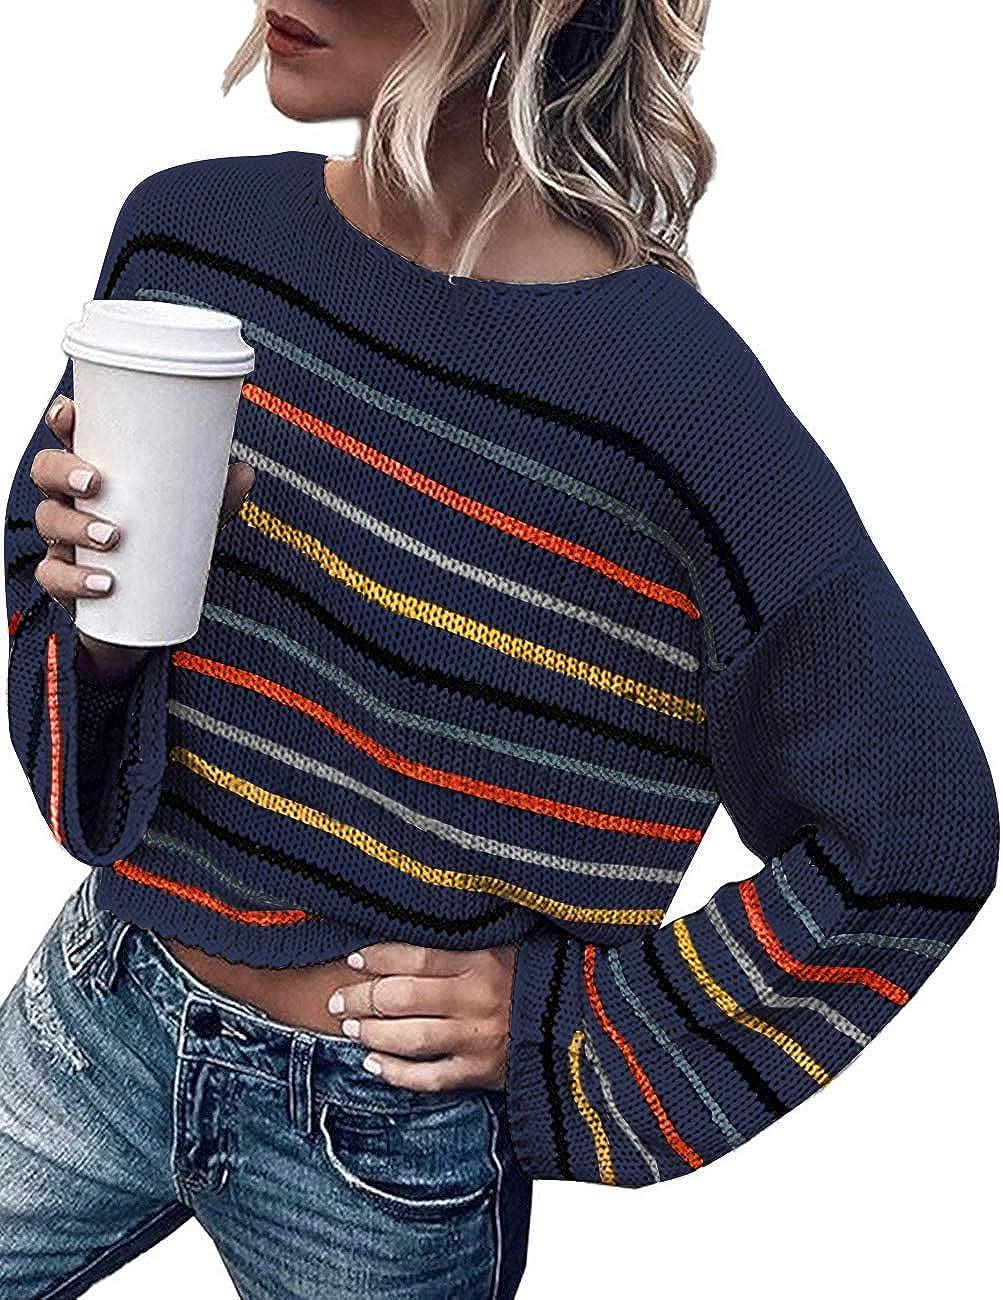 ZESICA Women's Long Bell Sleeve Rainbow Striped Loose Oversized Pullover Sweater Crop Shirt Tops